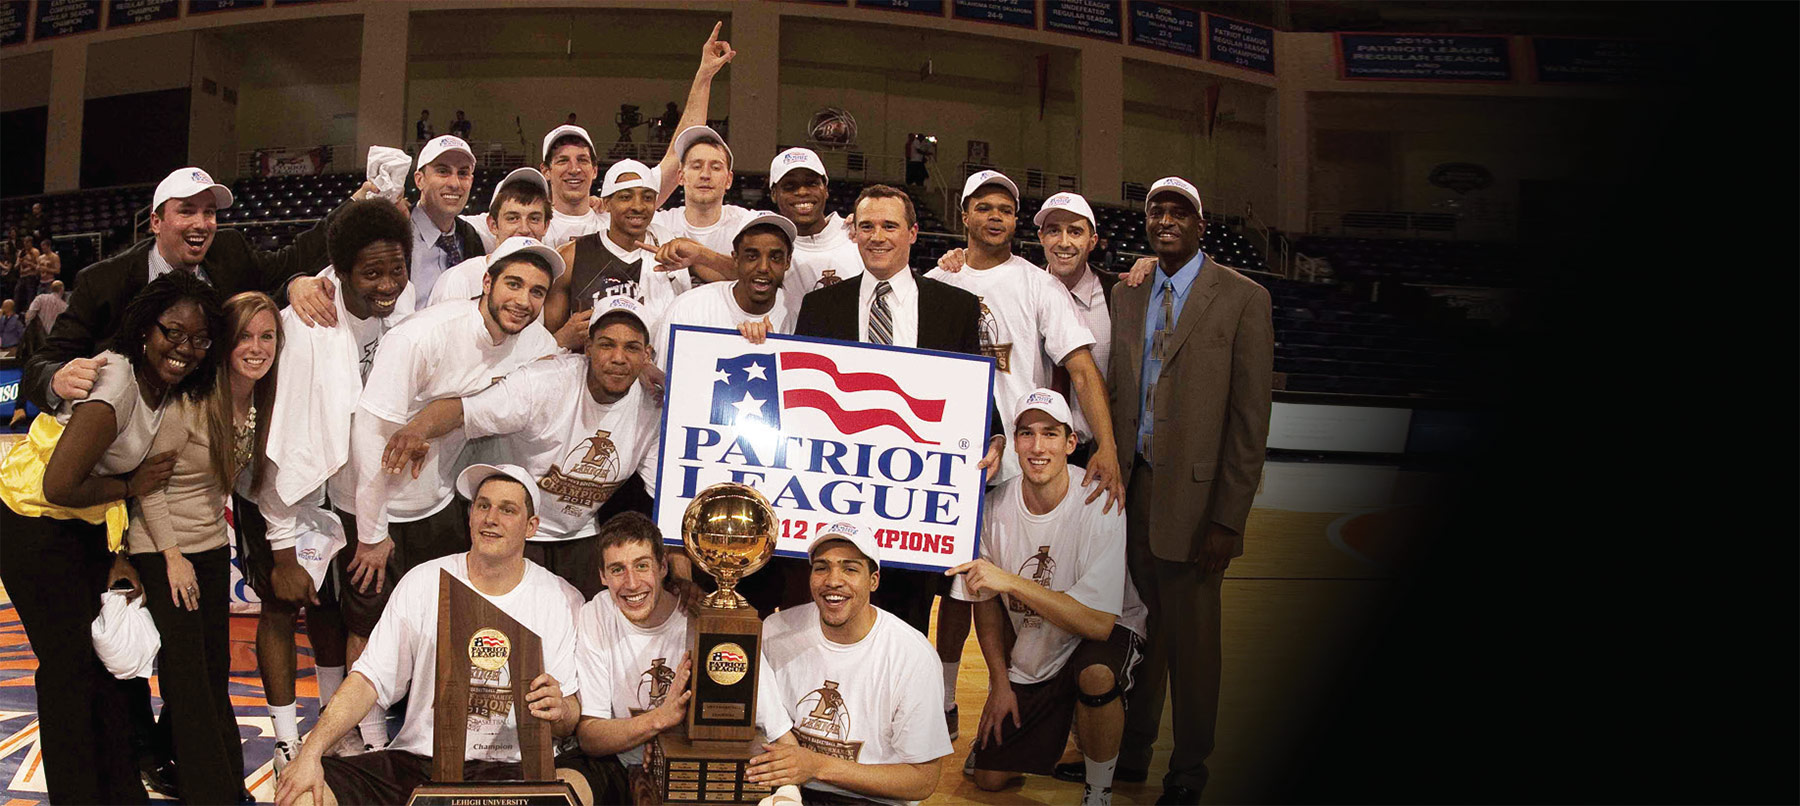 Lehigh University basketball team after winning the Patriot League championship